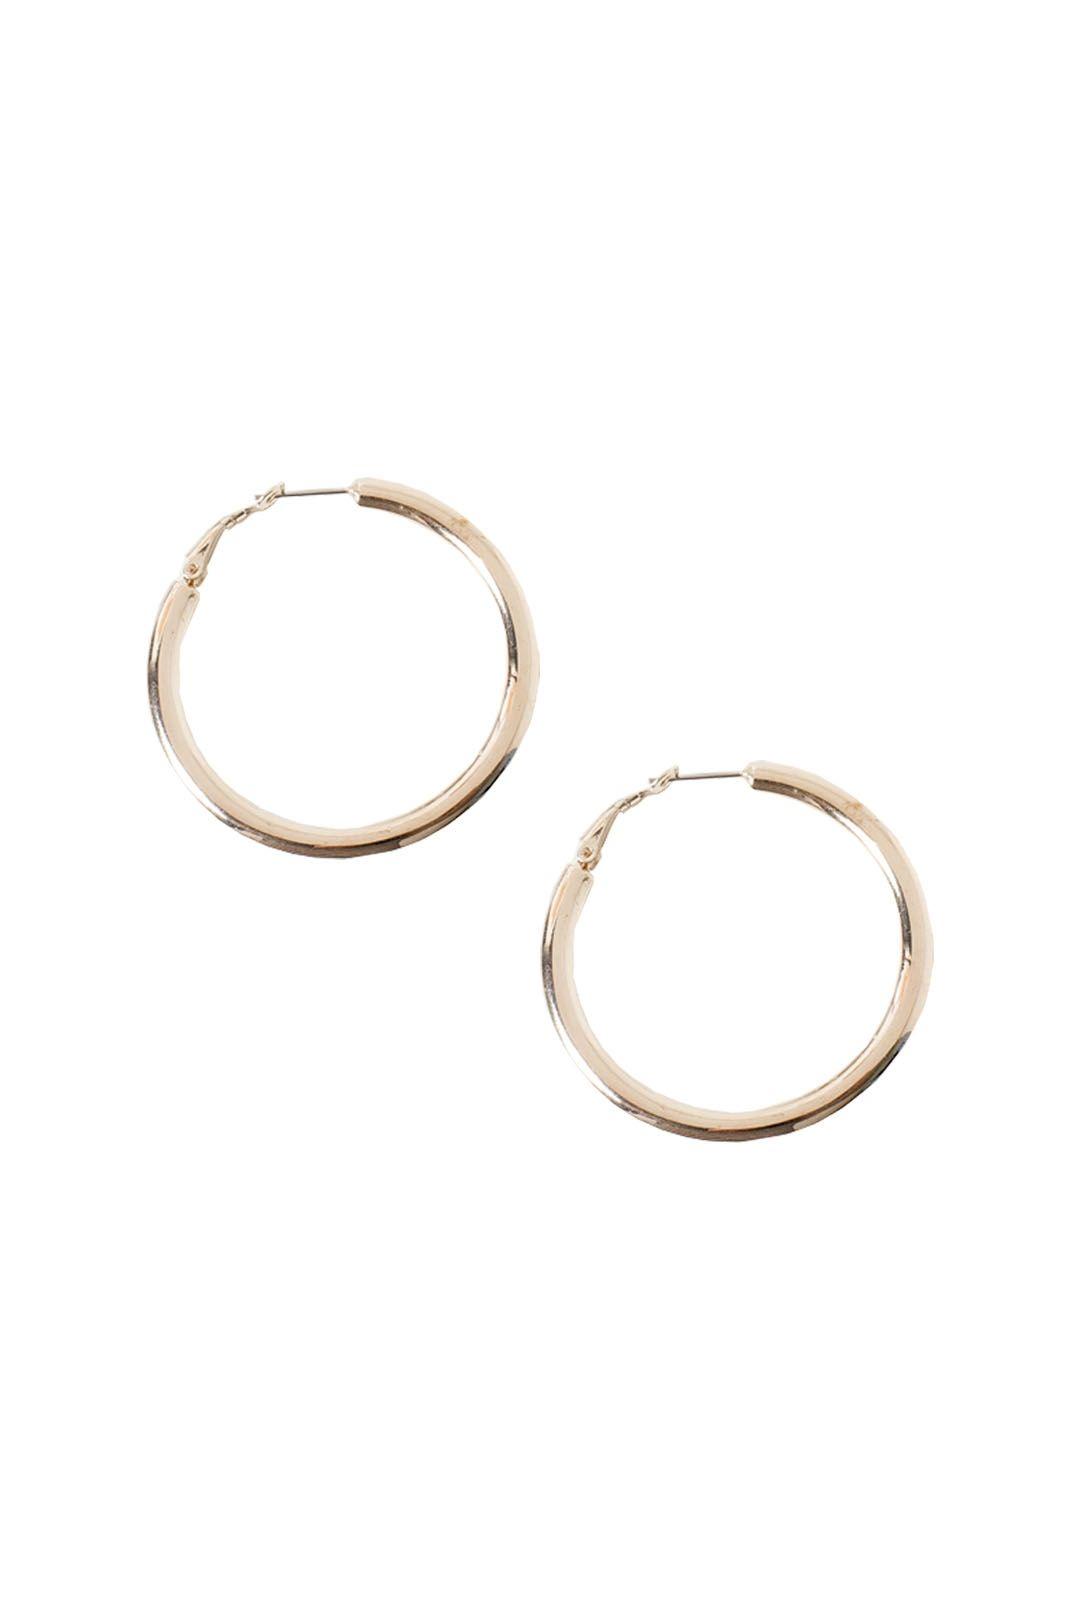 Adorne - Flat Medium Hoop Earring - Gold - Front